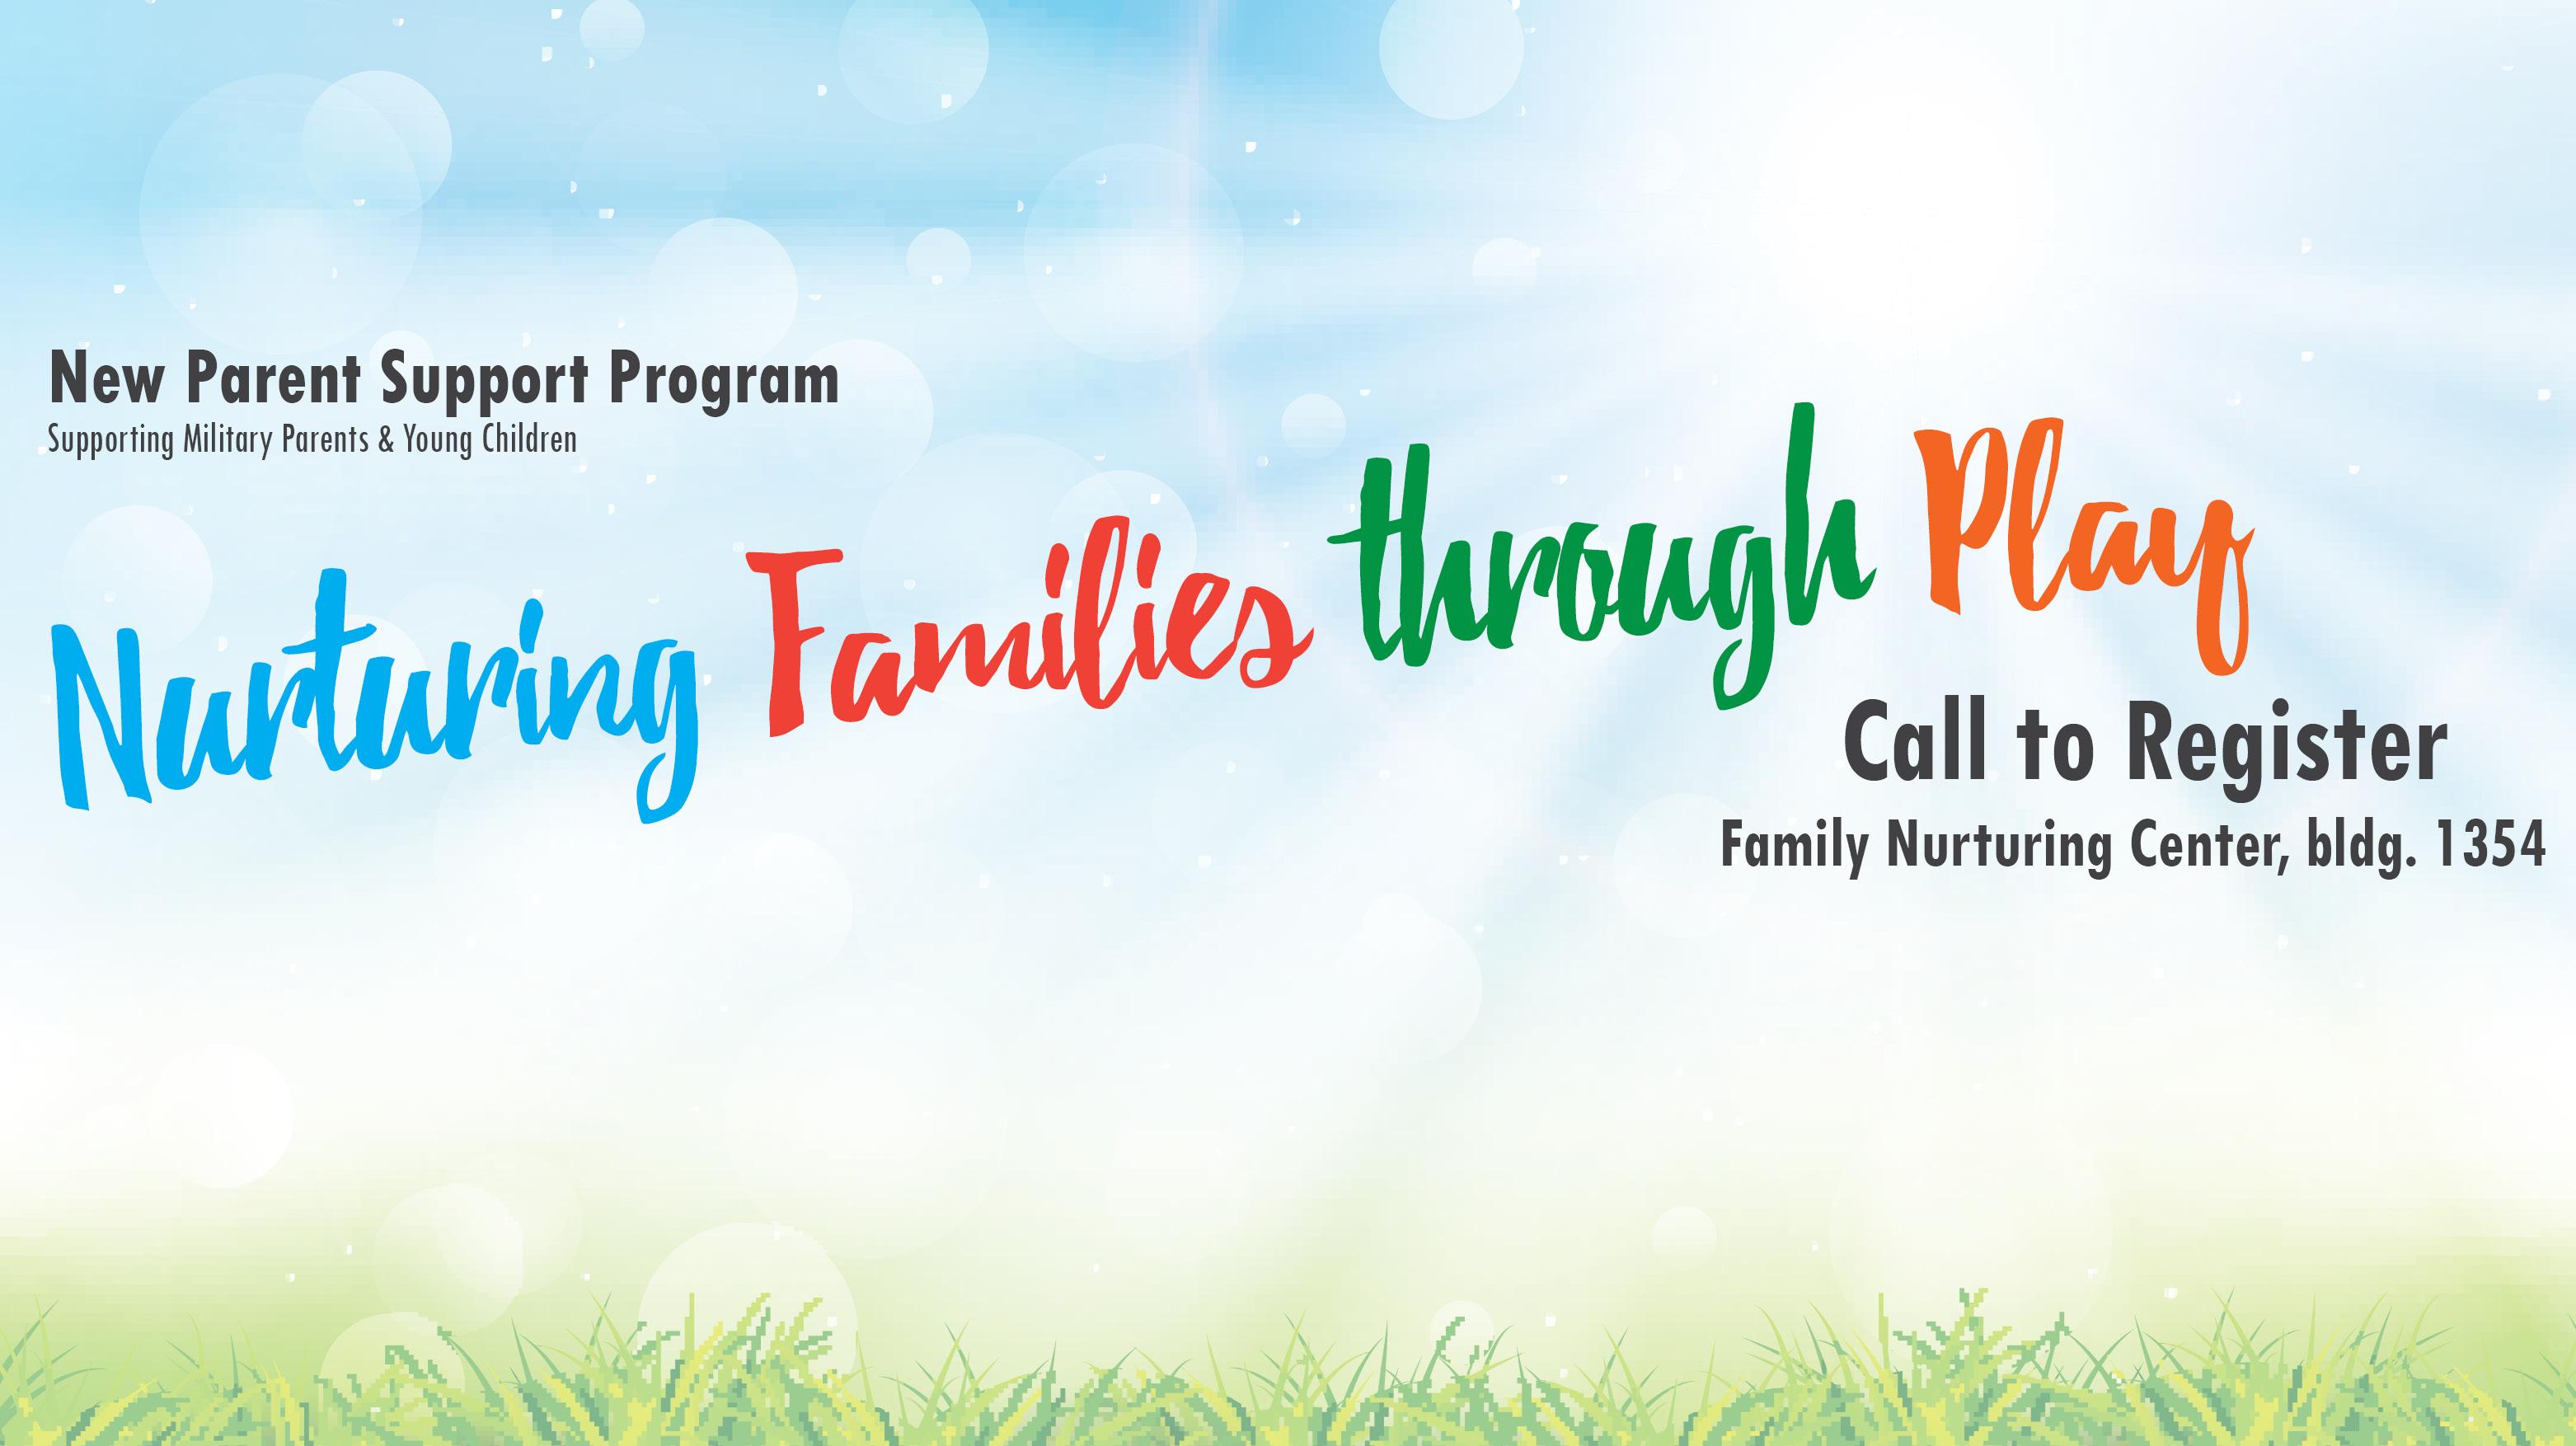 Nurturing Families Through Play